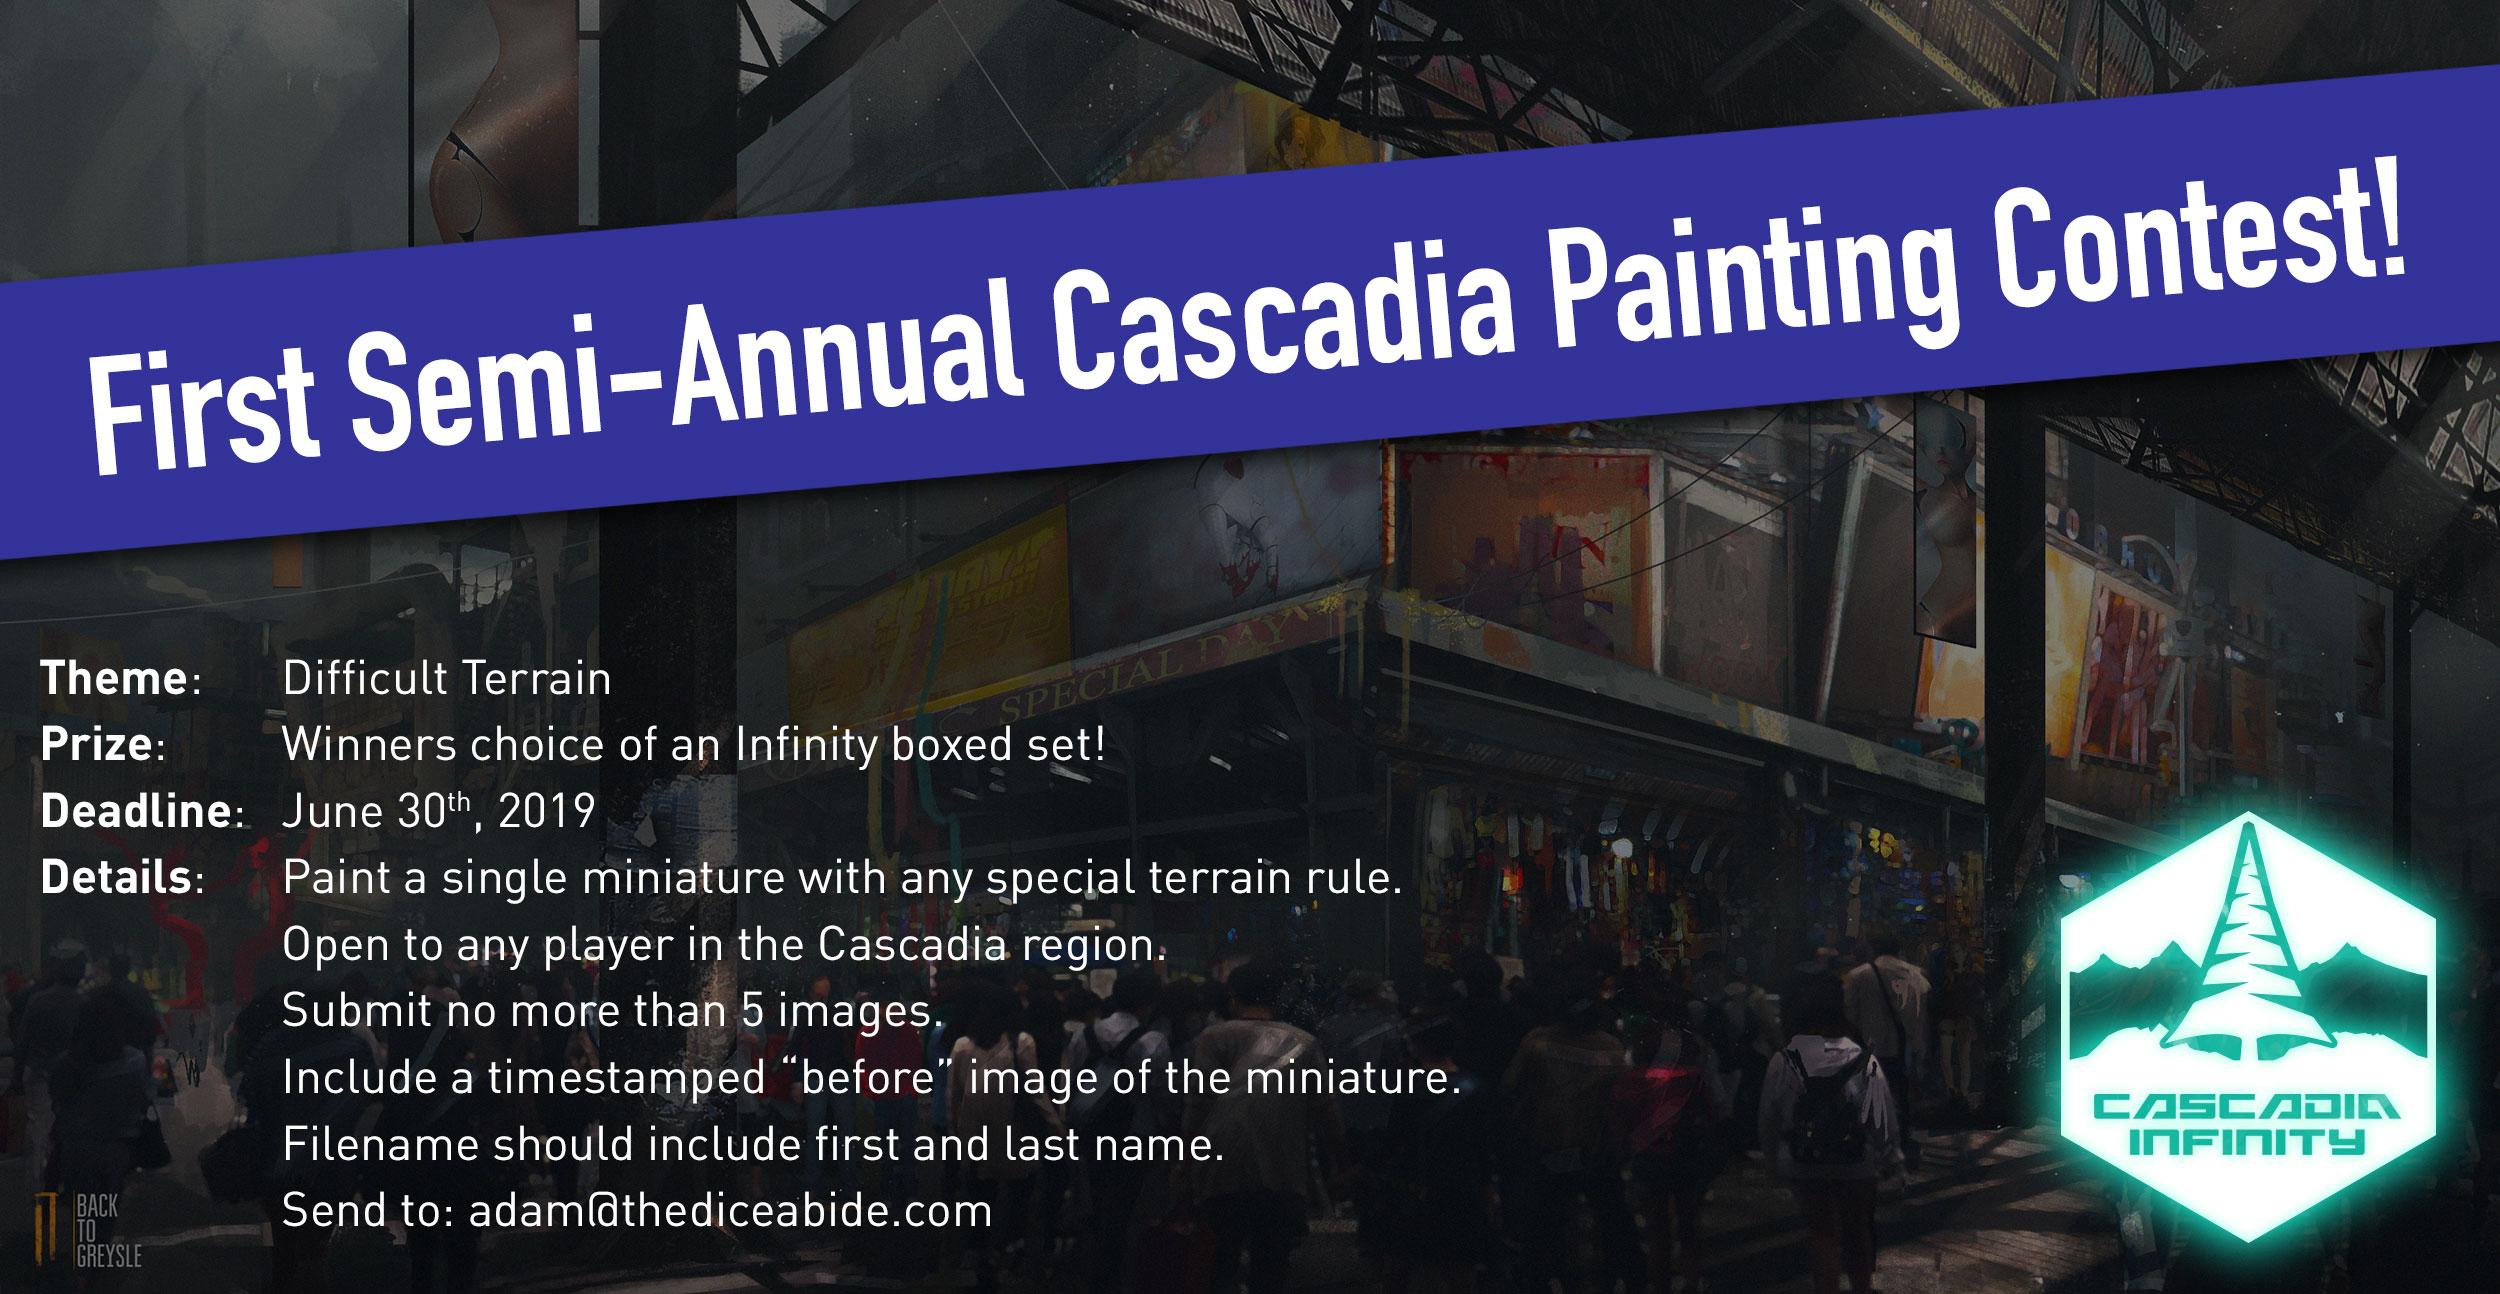 cascadia-painting.jpg